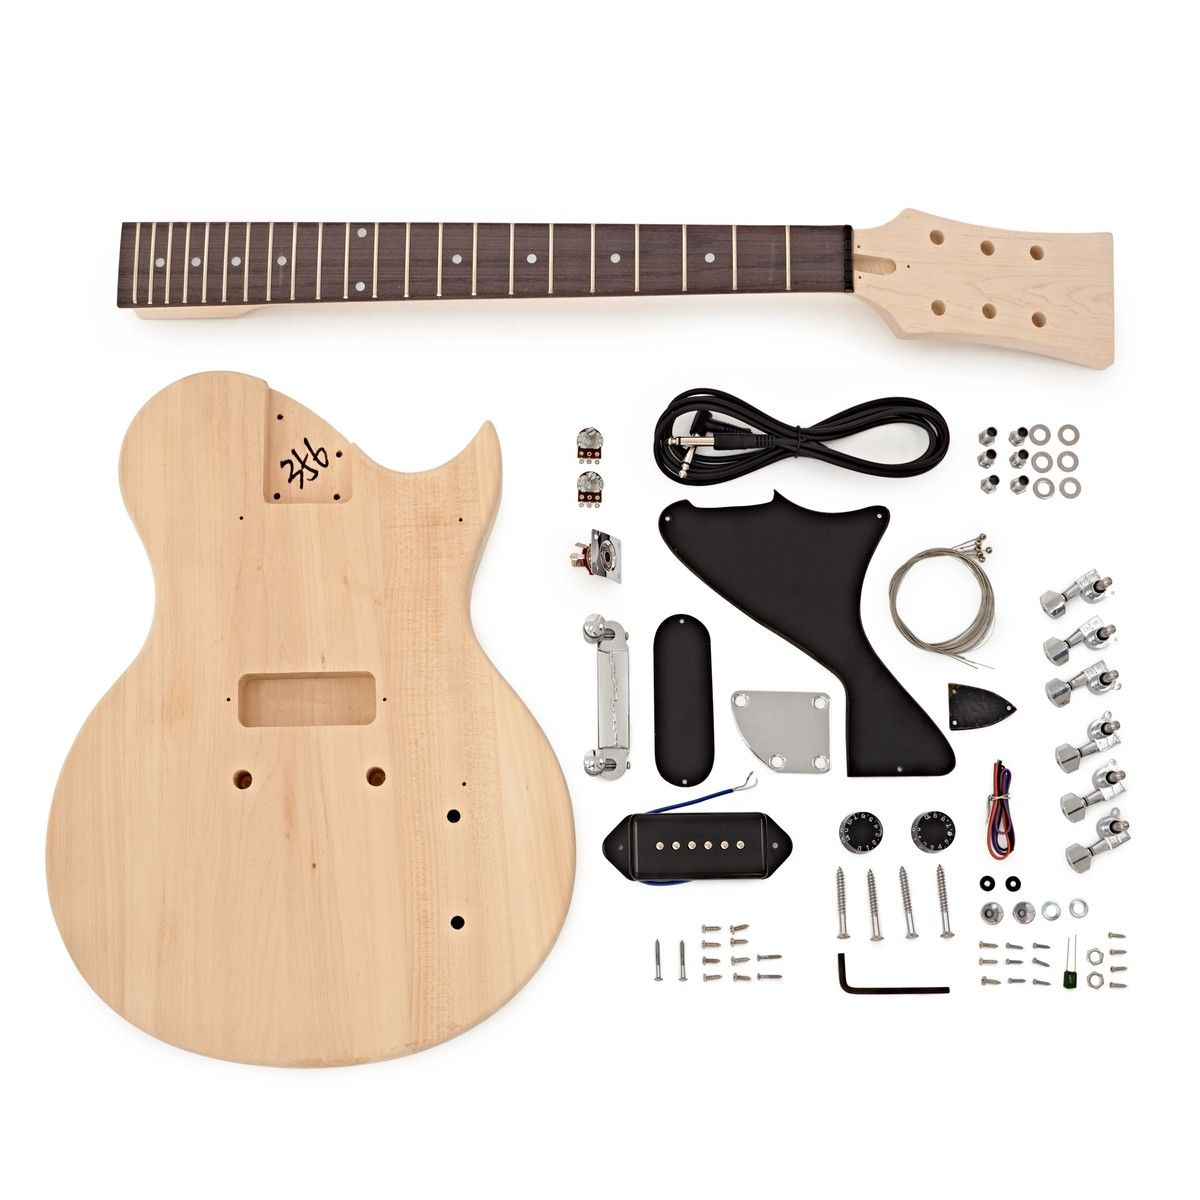 myydyin tuote suositut kaupat paras tukkumyyjä New Jersey Jr Electric Guitar DIY Kit | Guitars | Guitar diy ...